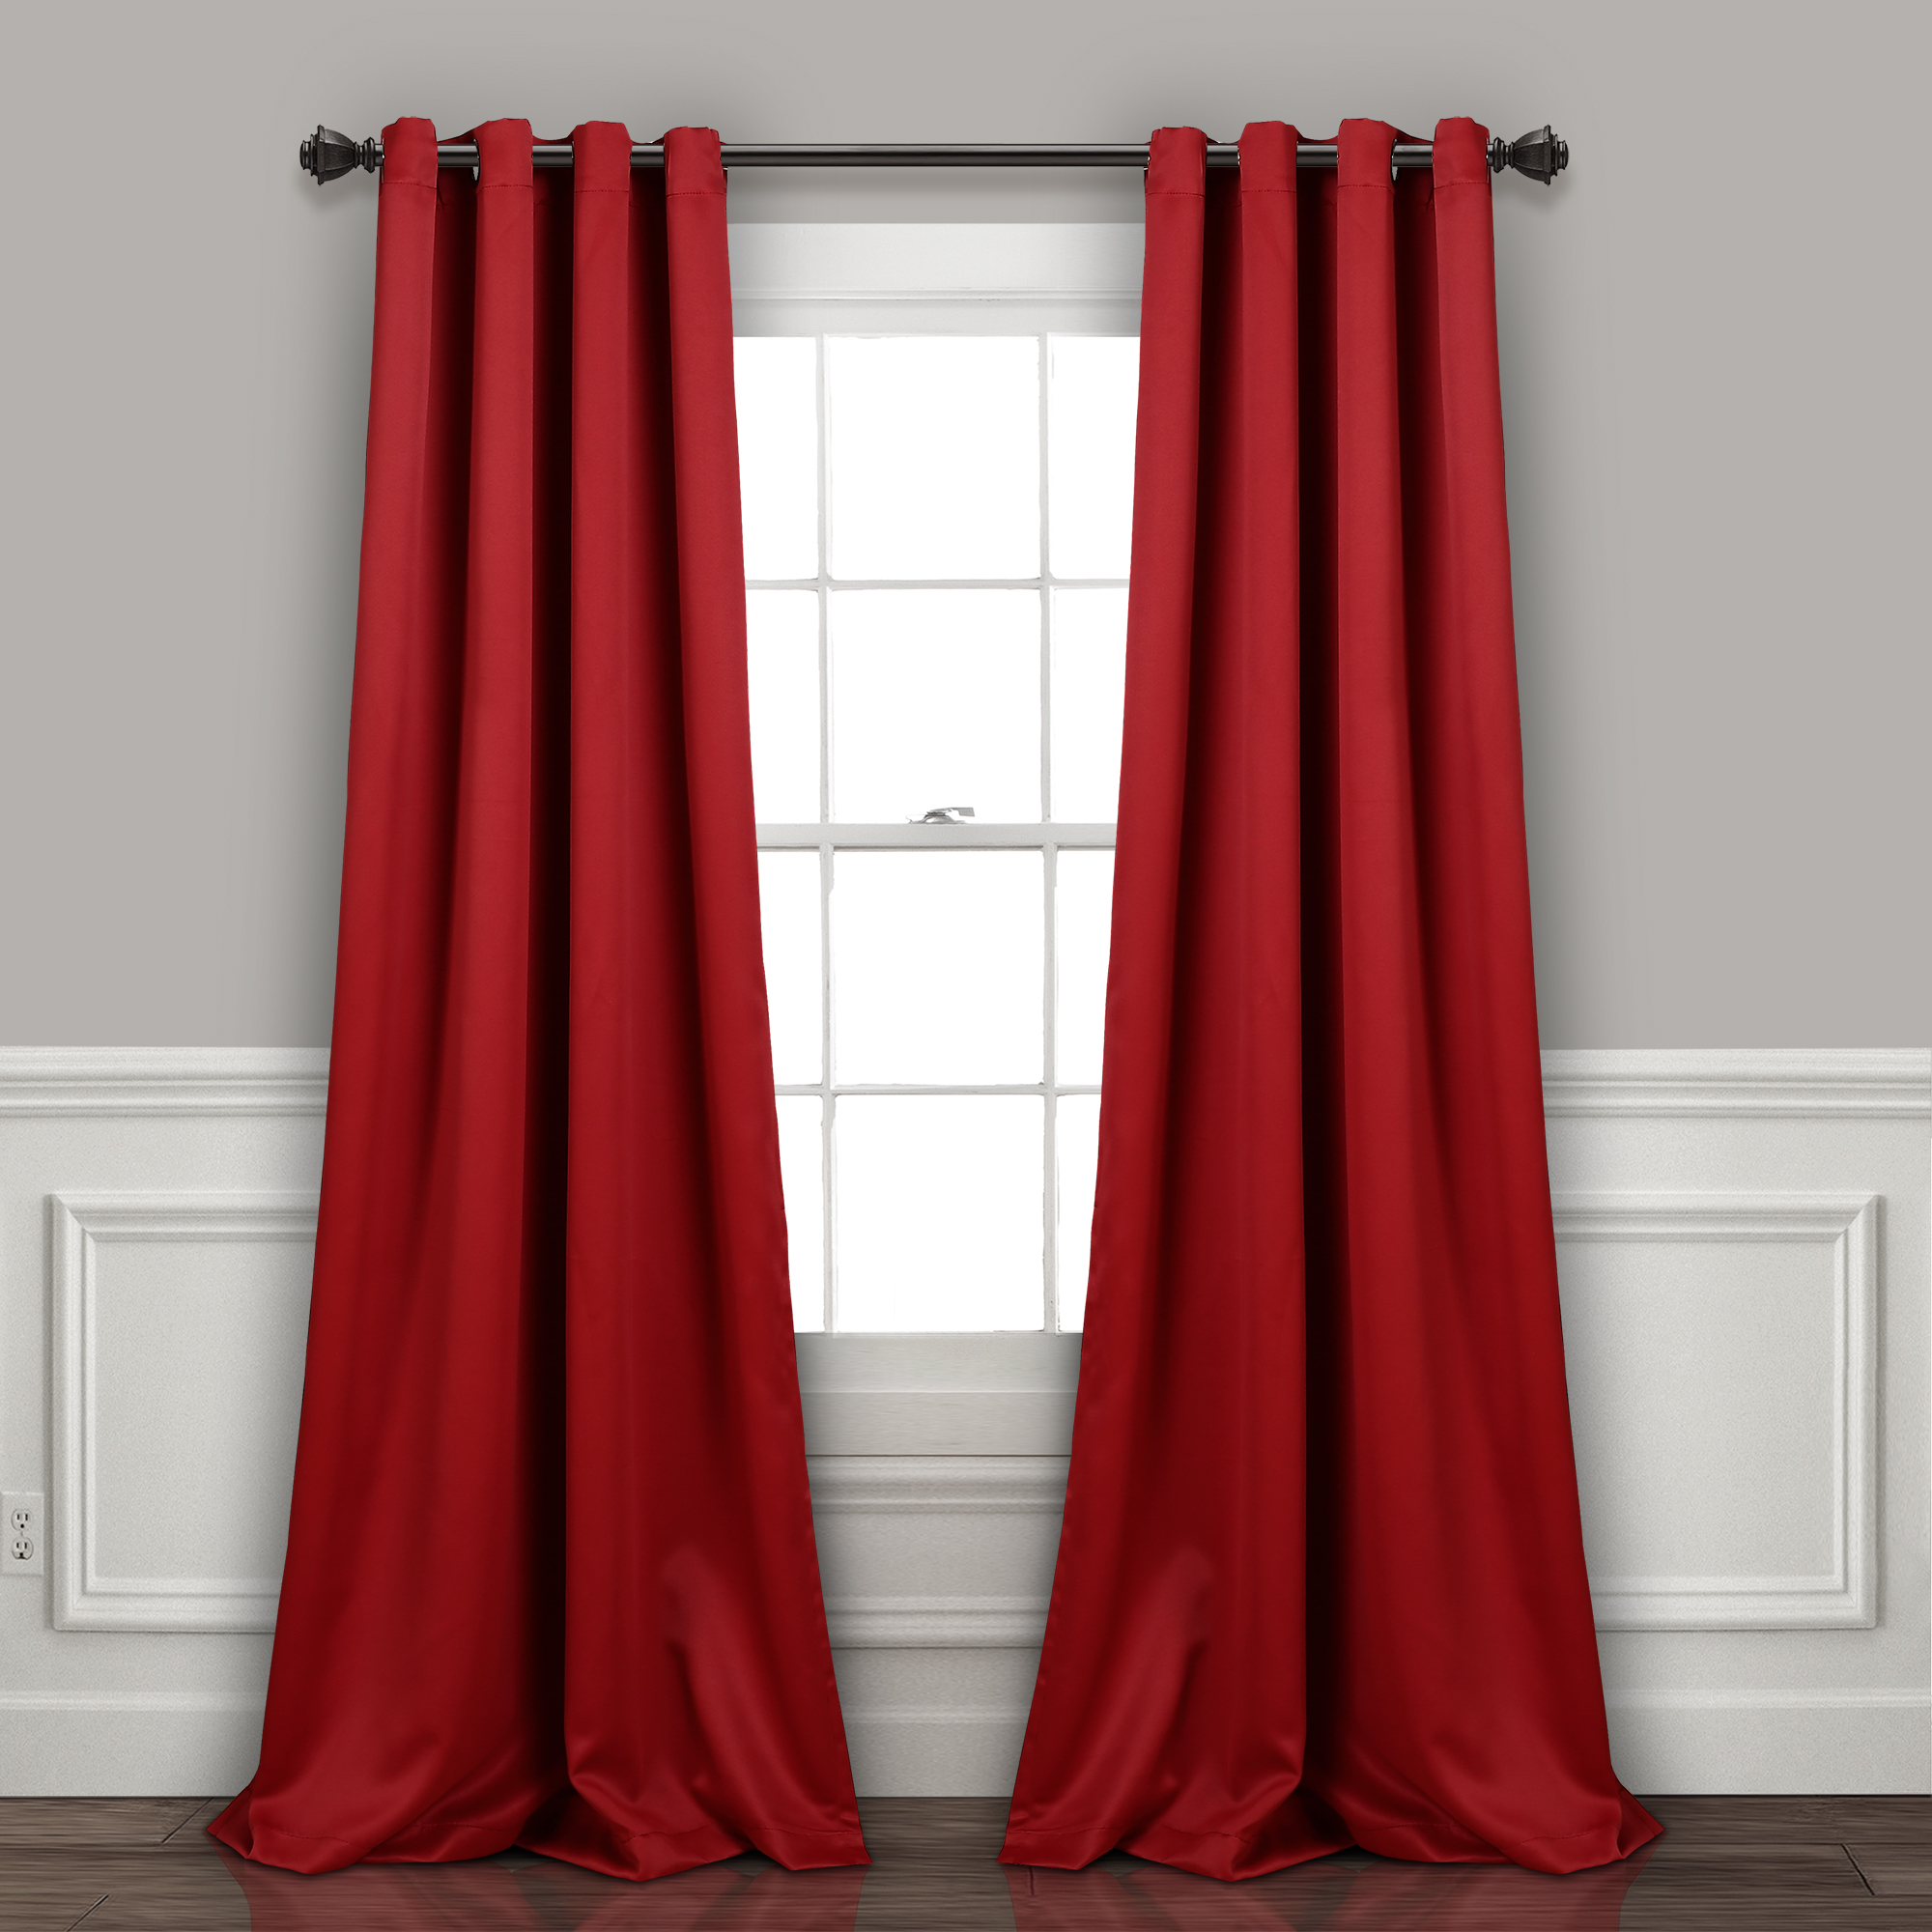 Lush Décor Insulated Grommet Blackout Curtain Panels Pair